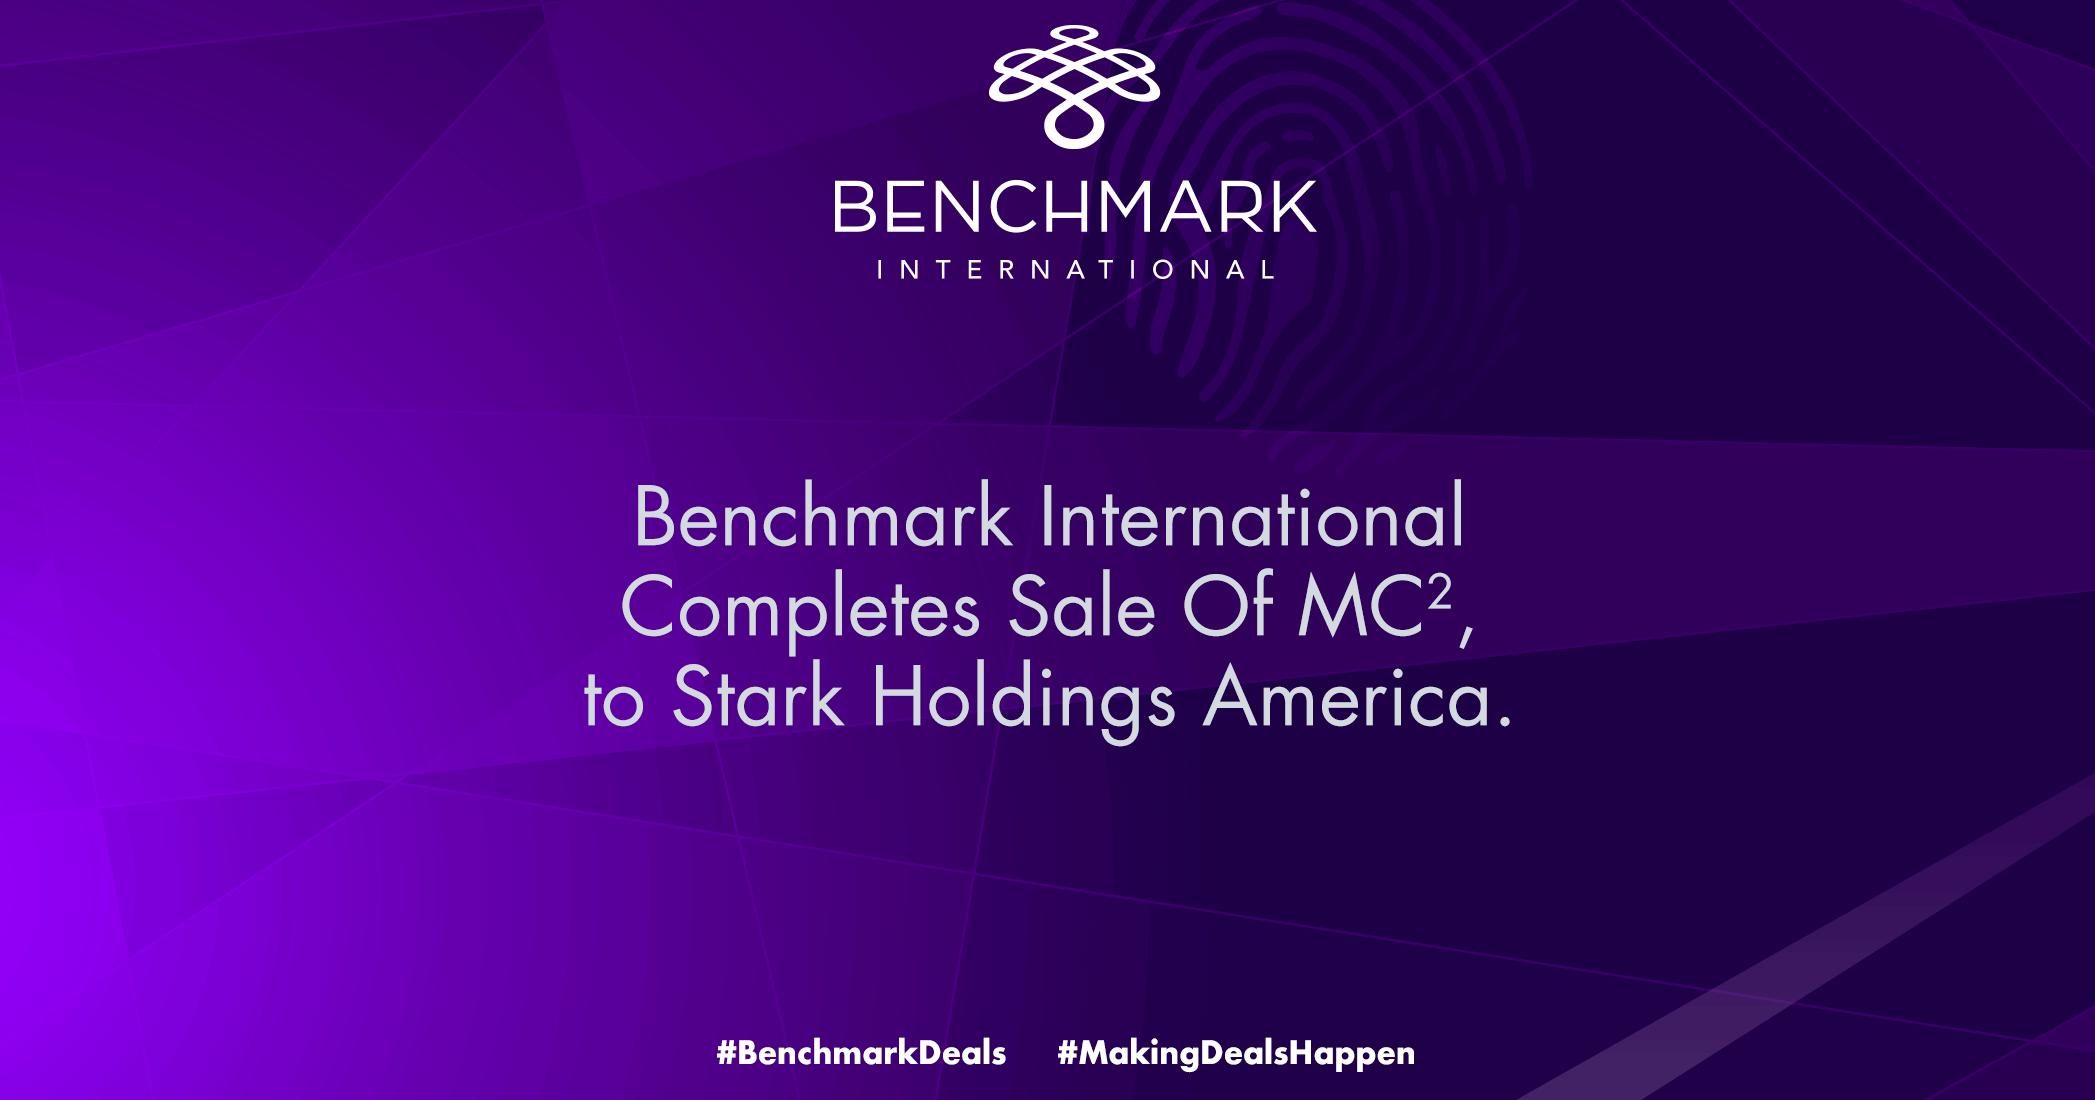 Benchmark International completes Sale of MC2, INC to Stark Holdings America, INC.